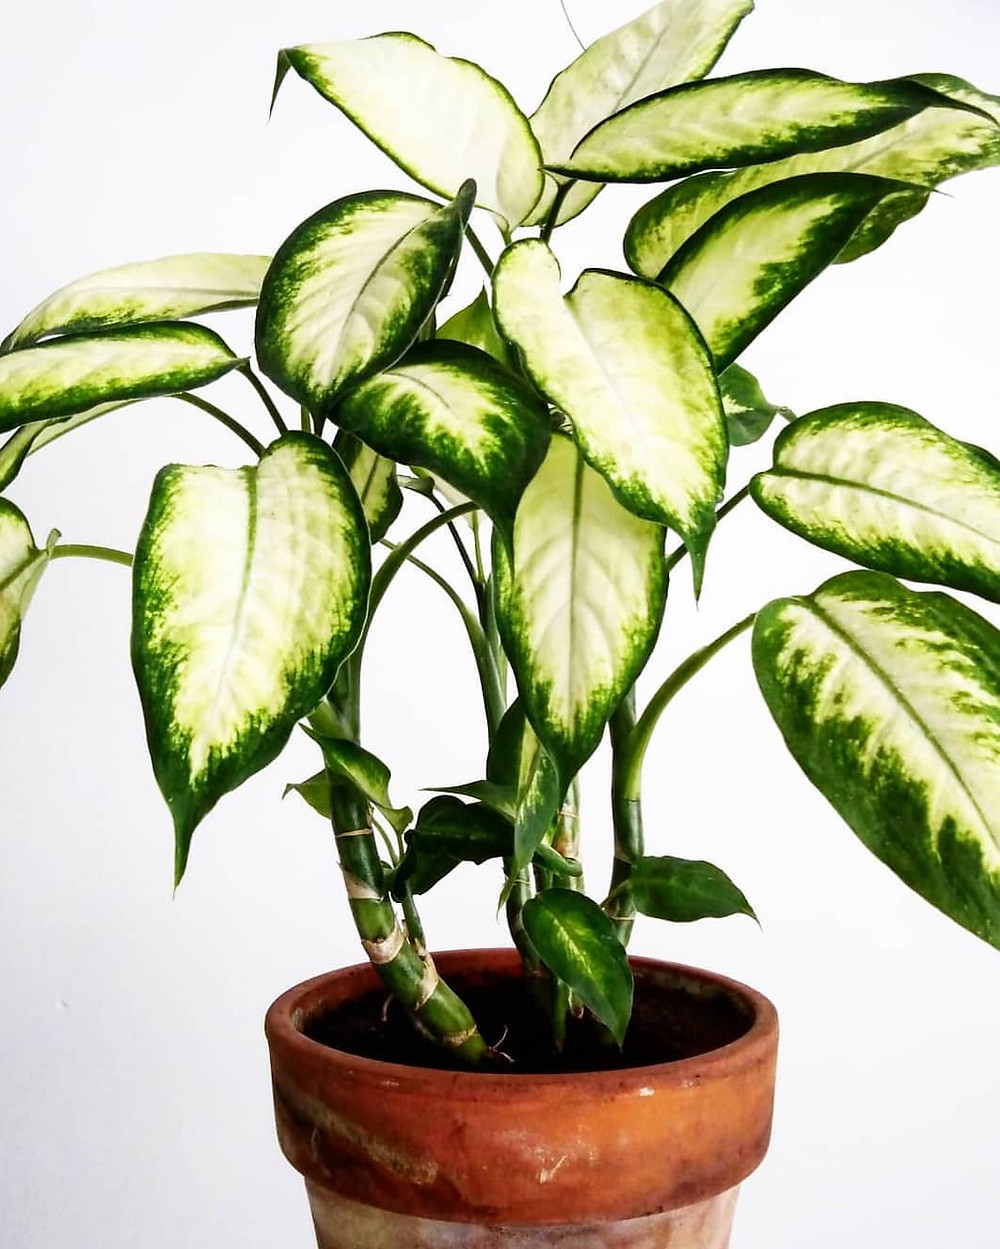 Dieffenbachia quick fast growing houseplants